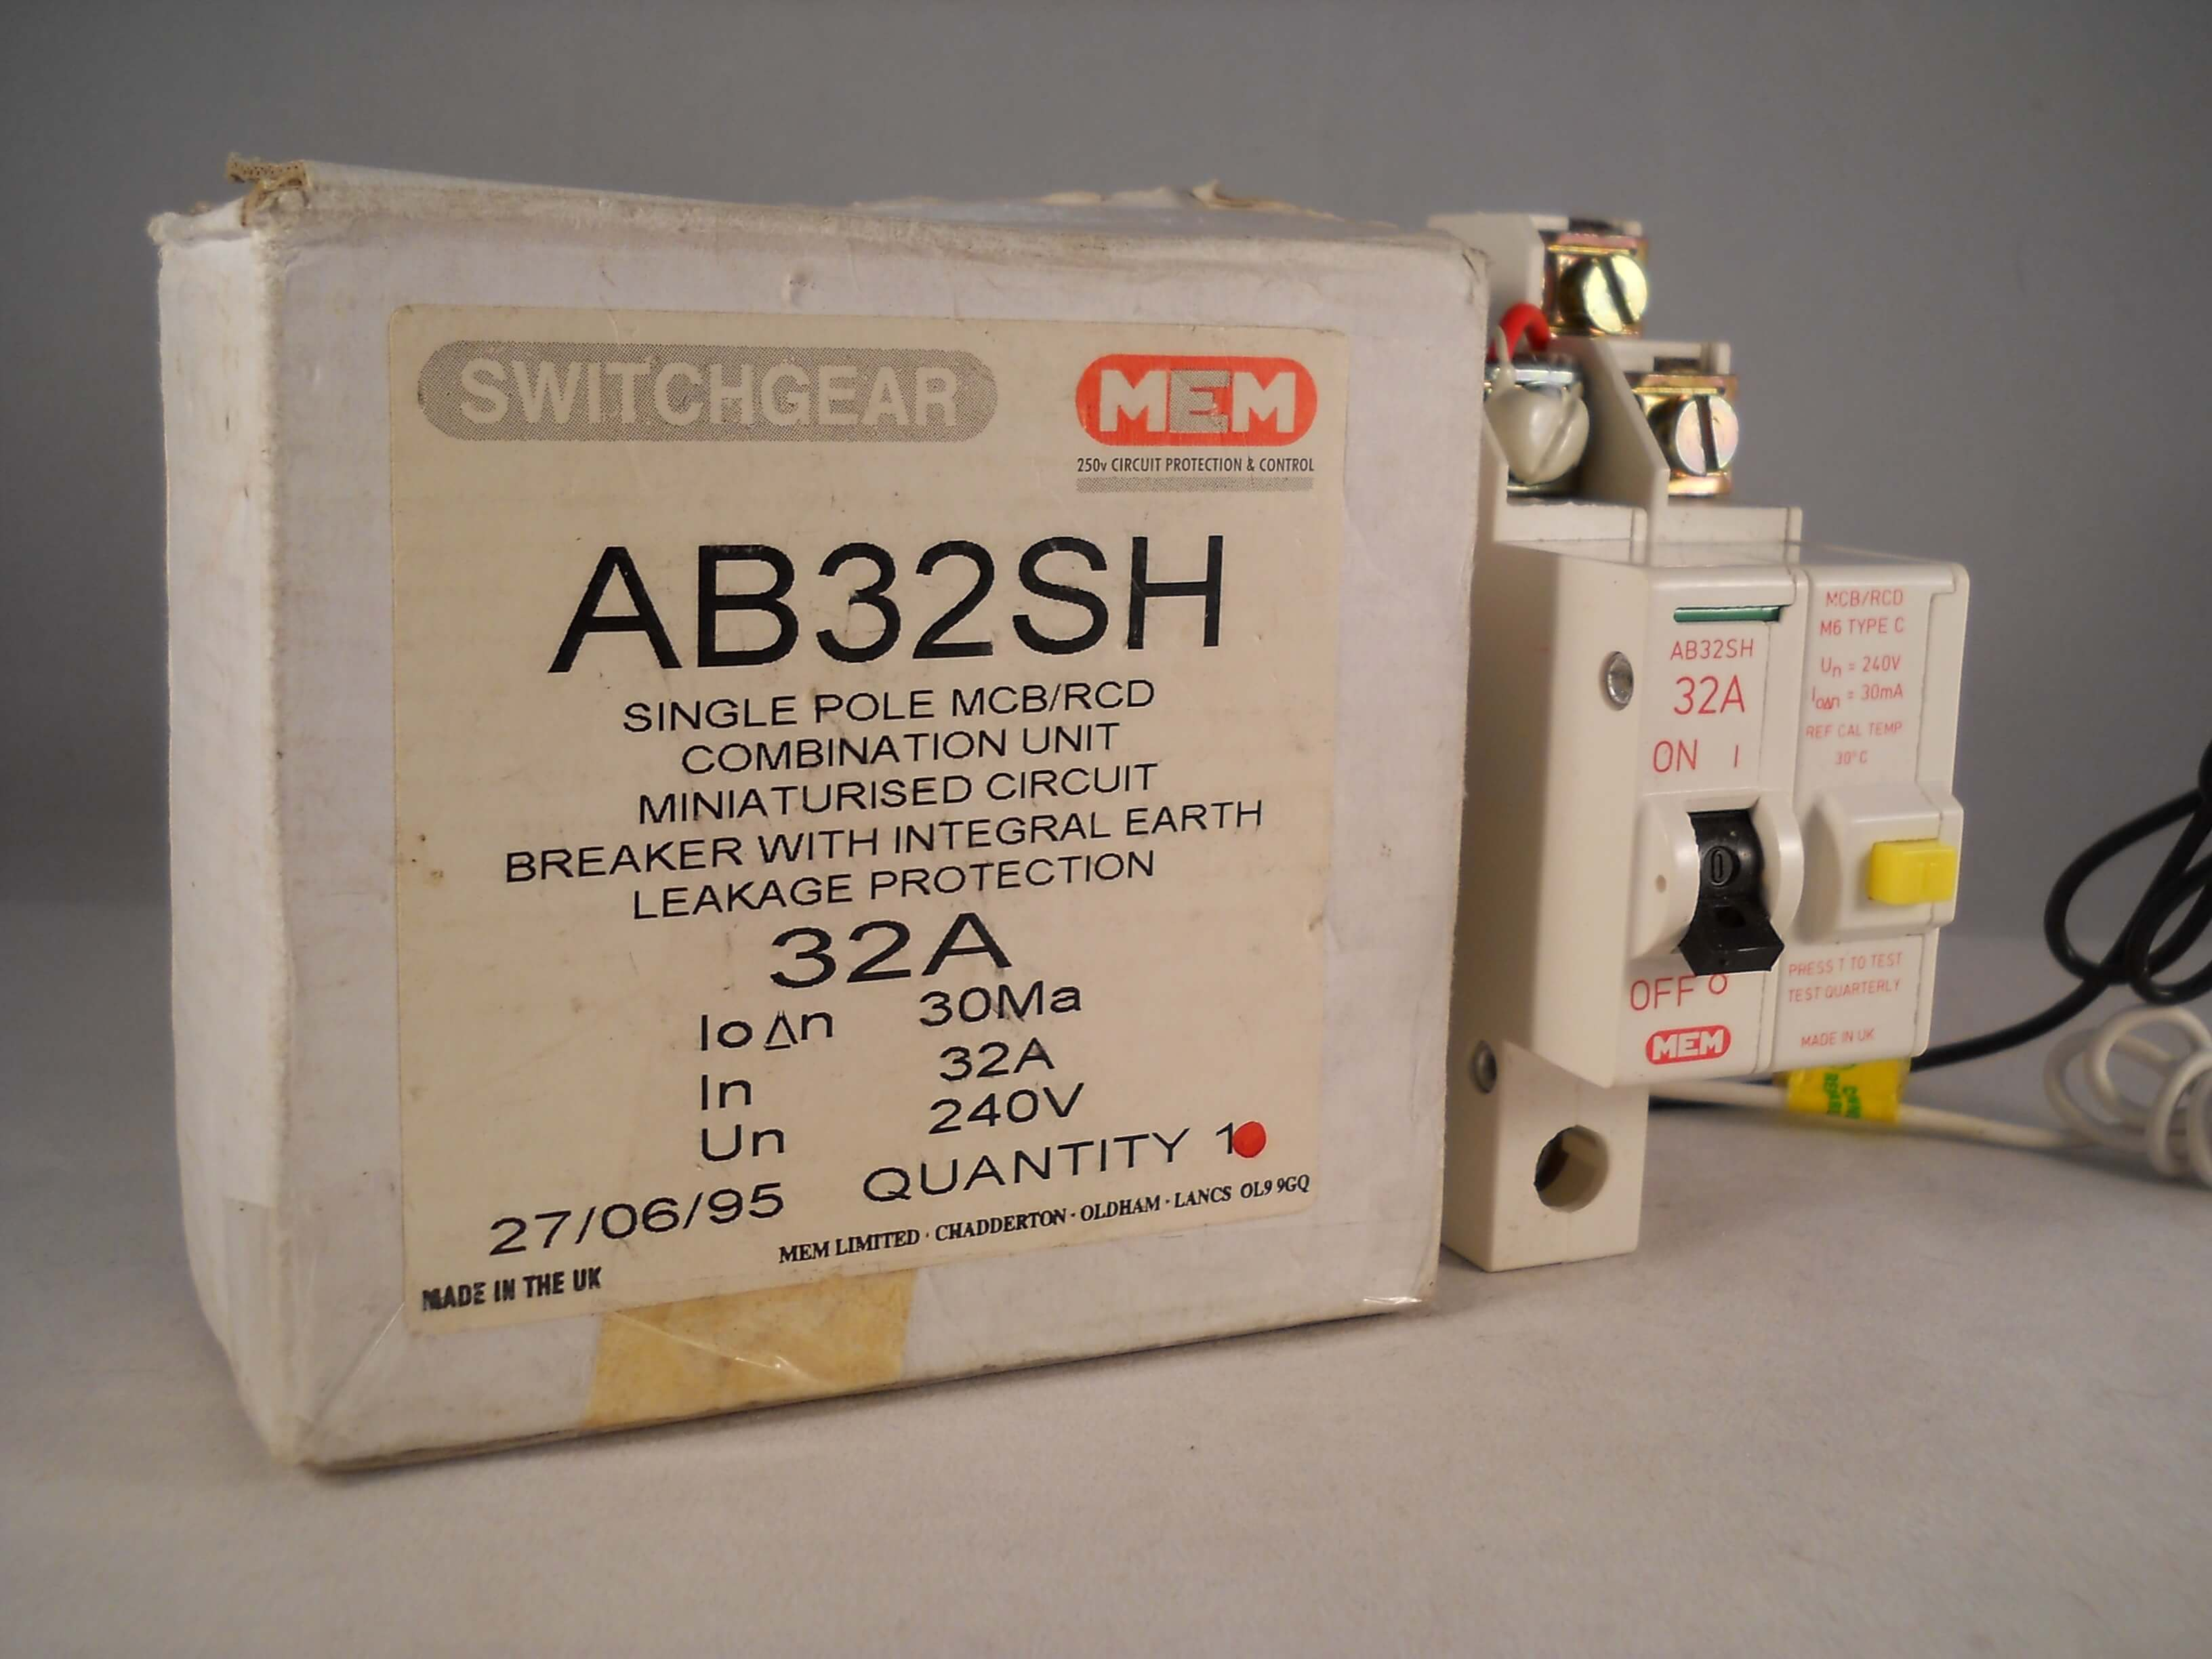 Magnificent Mem Memera 2000 Rcbo Mcb Rcd 32 Amp 30Ma Type C 32A Rcd Memshield 2 Wiring Digital Resources Dadeaprontobusorg